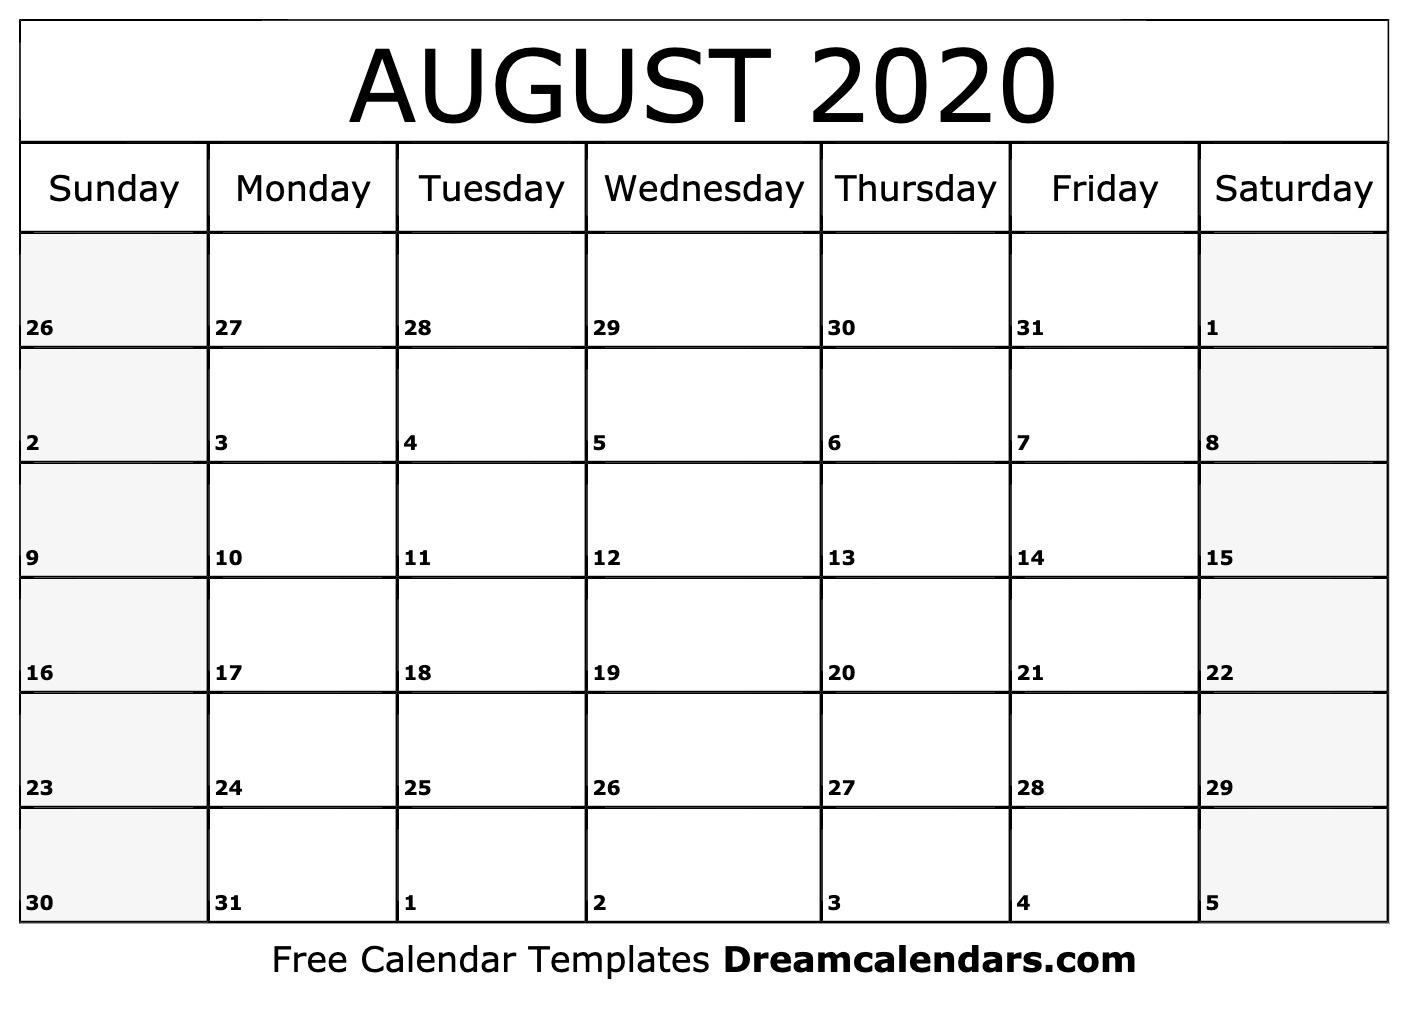 Printable August 2020 Calendar_Blank Calendar Of August 2020